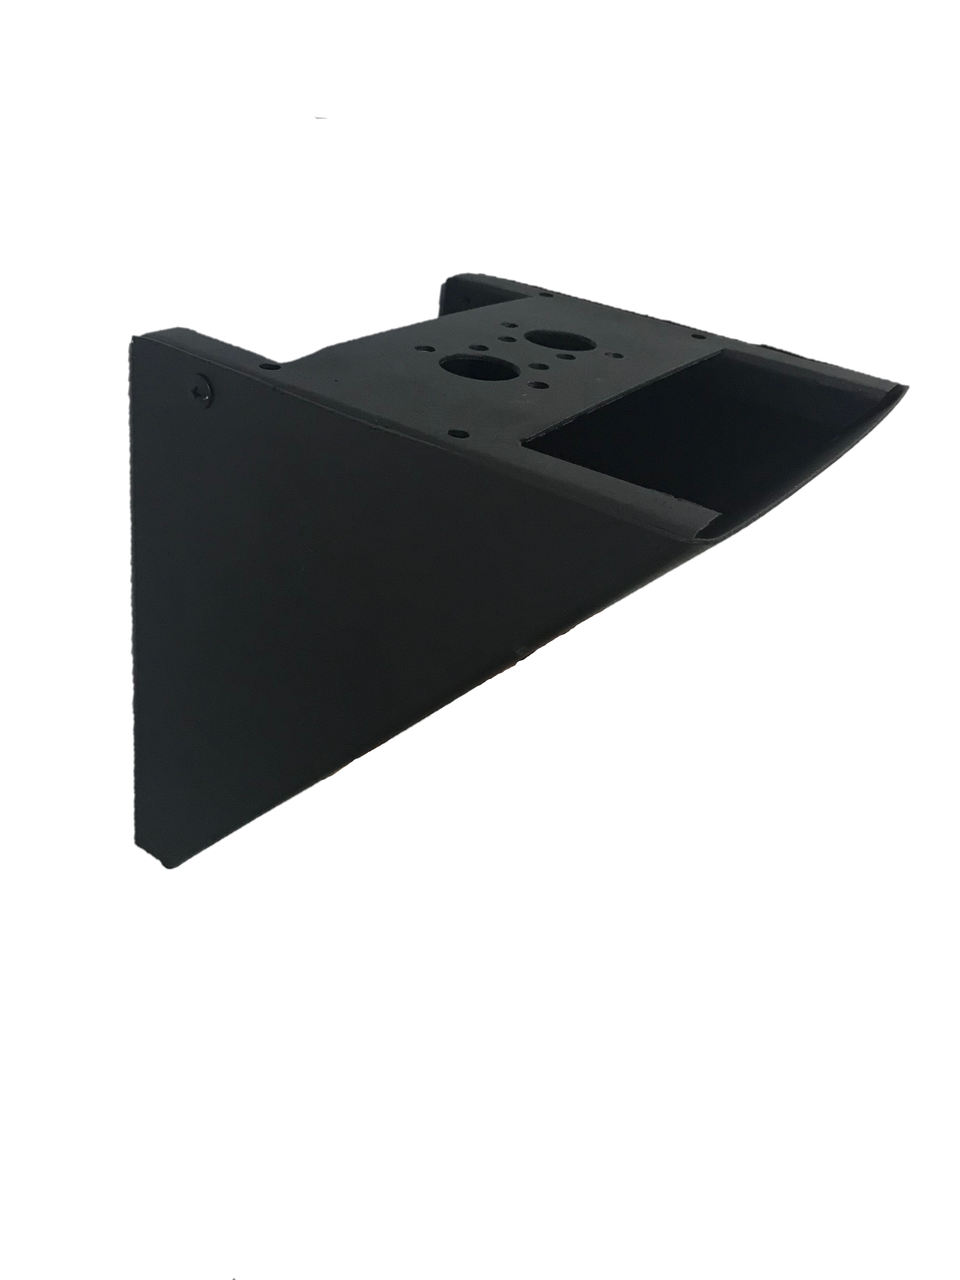 Кронштейн настенный для Планар 2д, 4дм2, 44д - фото 3